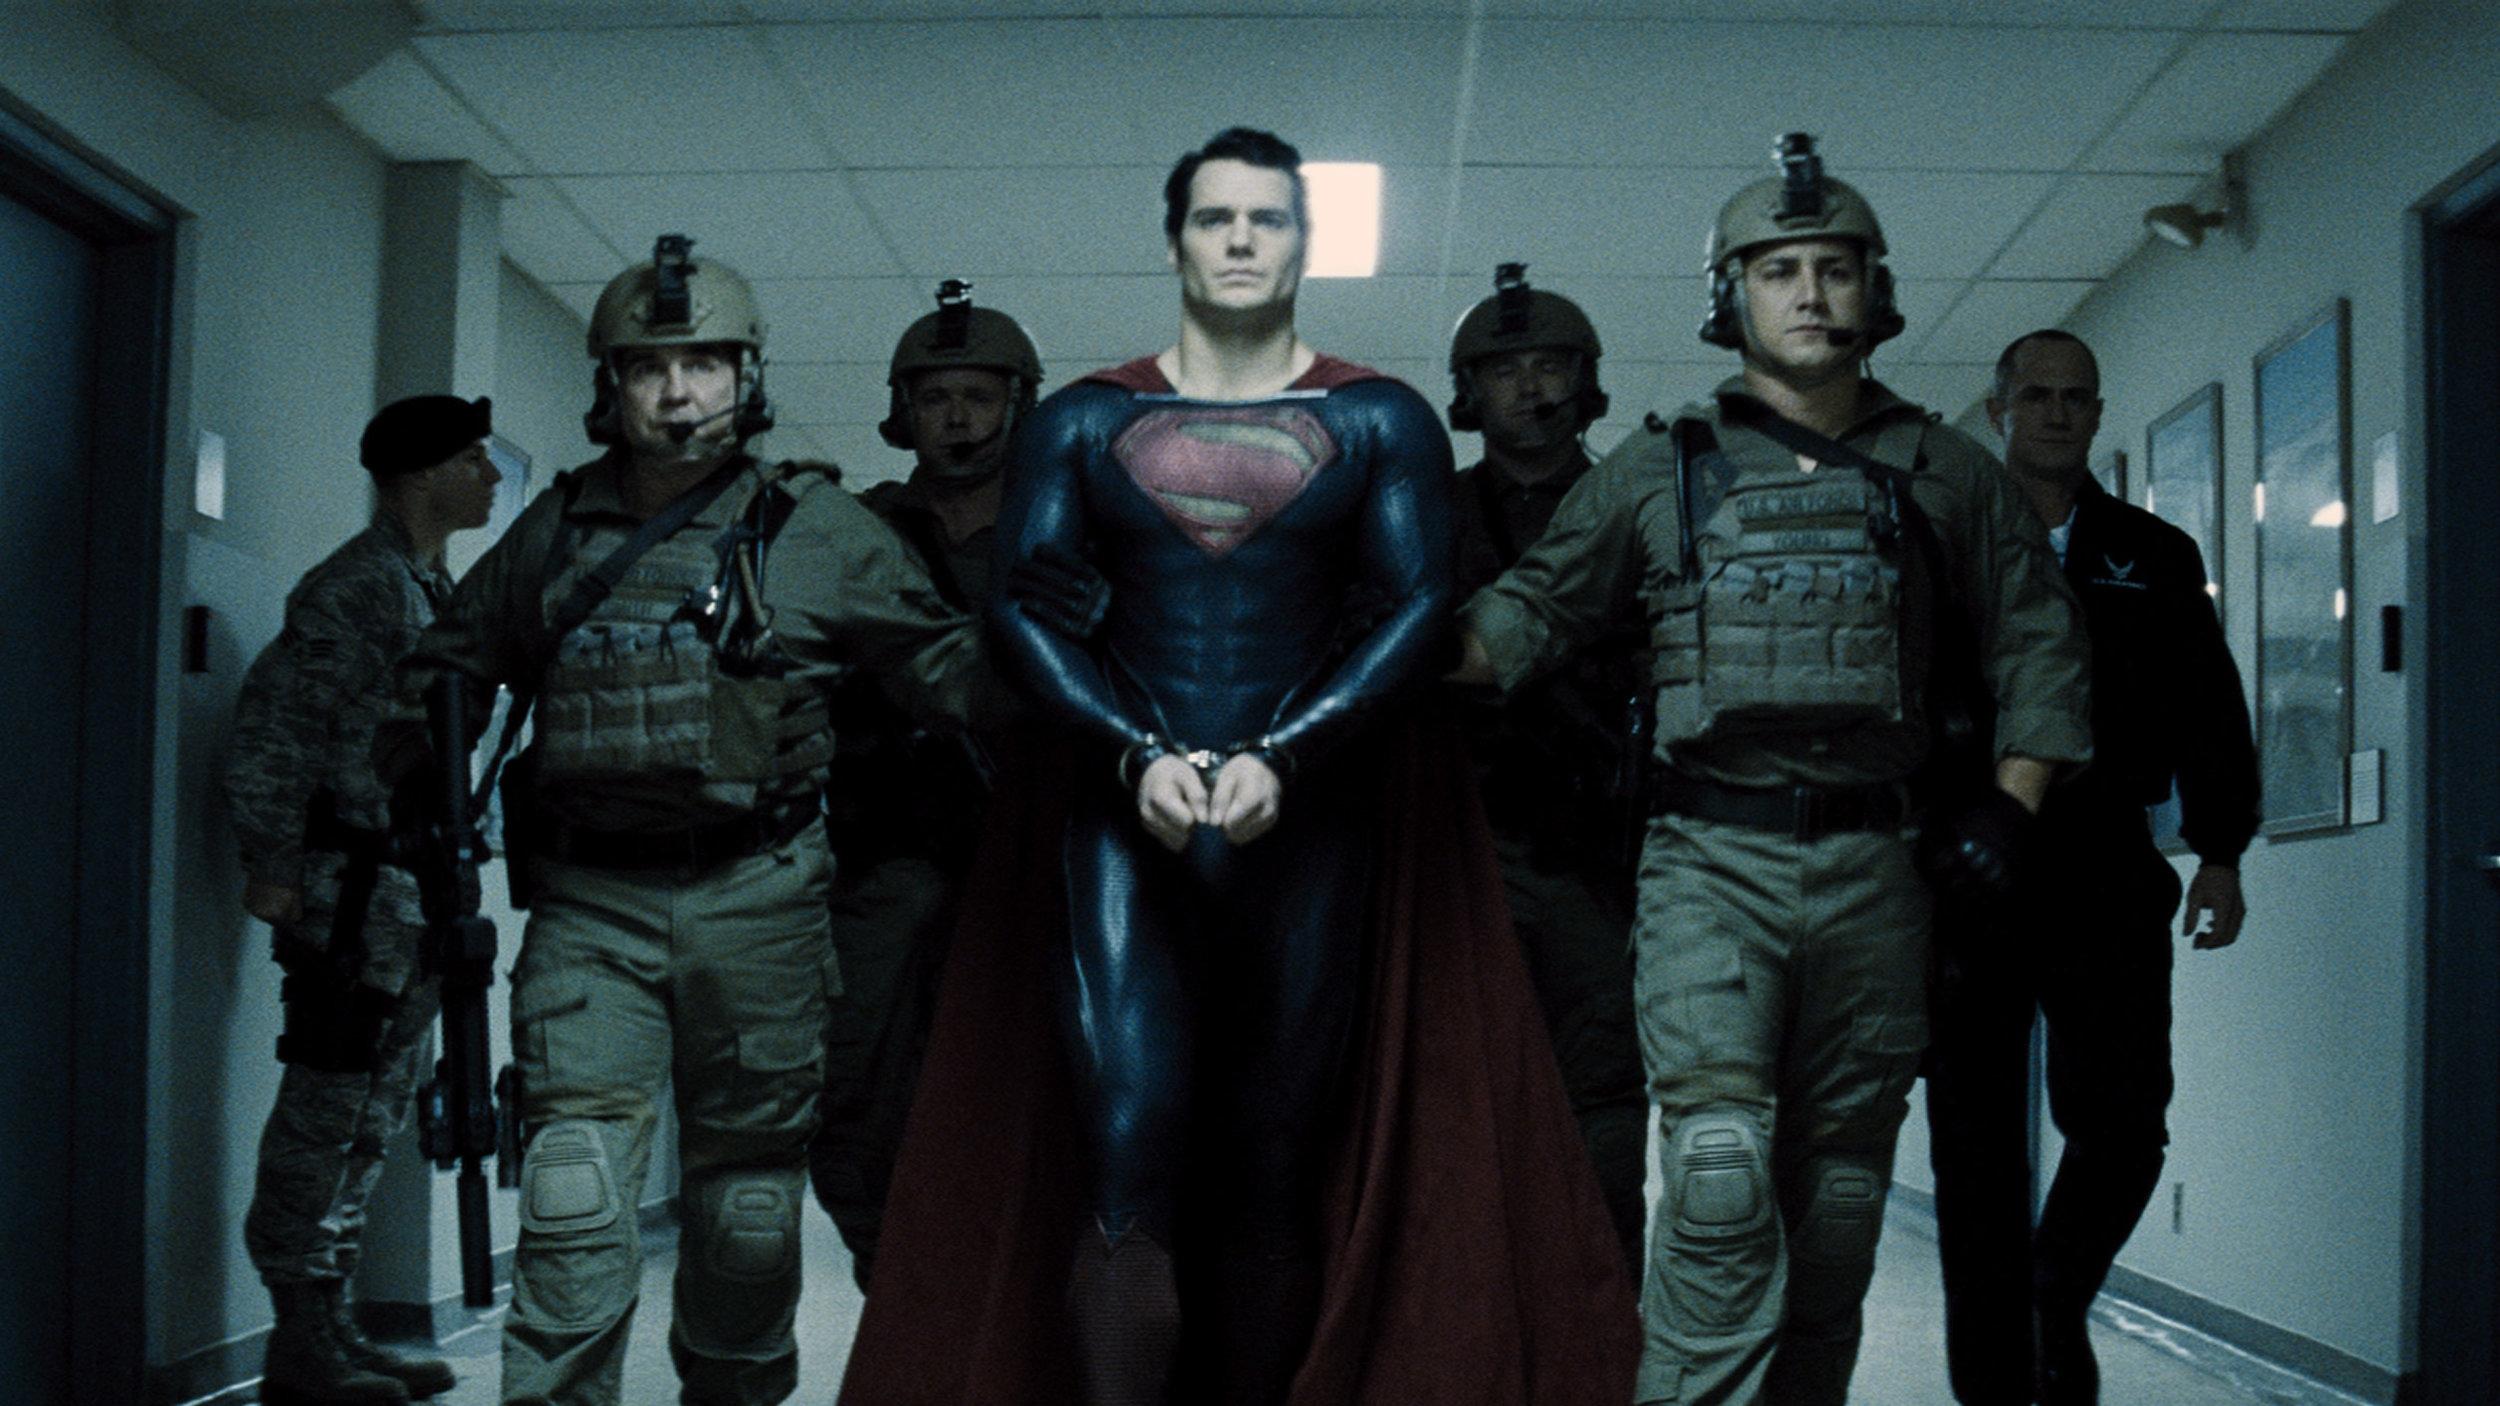 Superman-arrested-movie-scene-wallpaper1.jpg